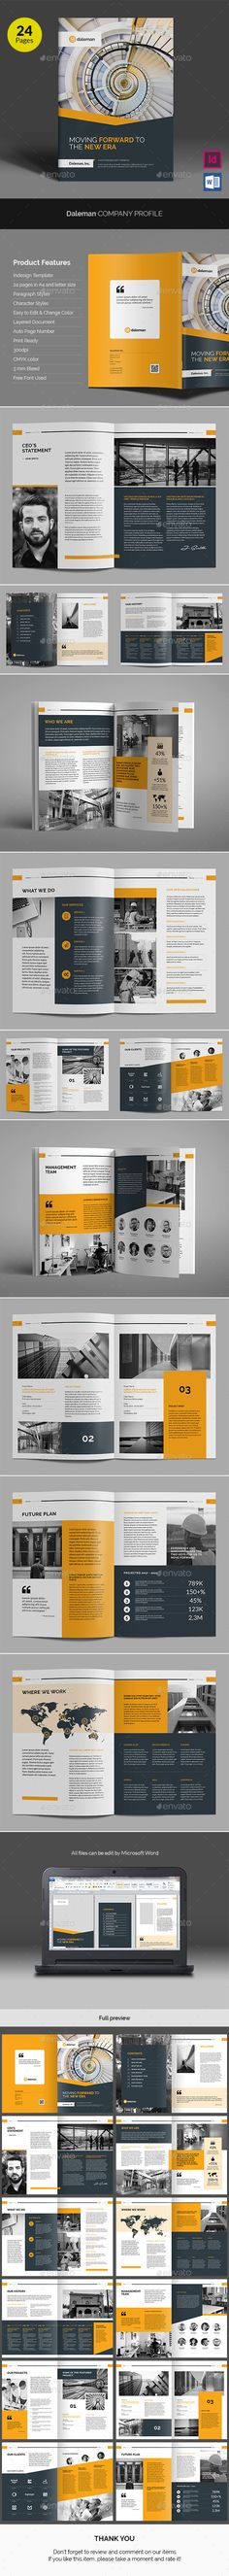 Company Profile Builder Brochure Templates Brochure Templates - company business profile